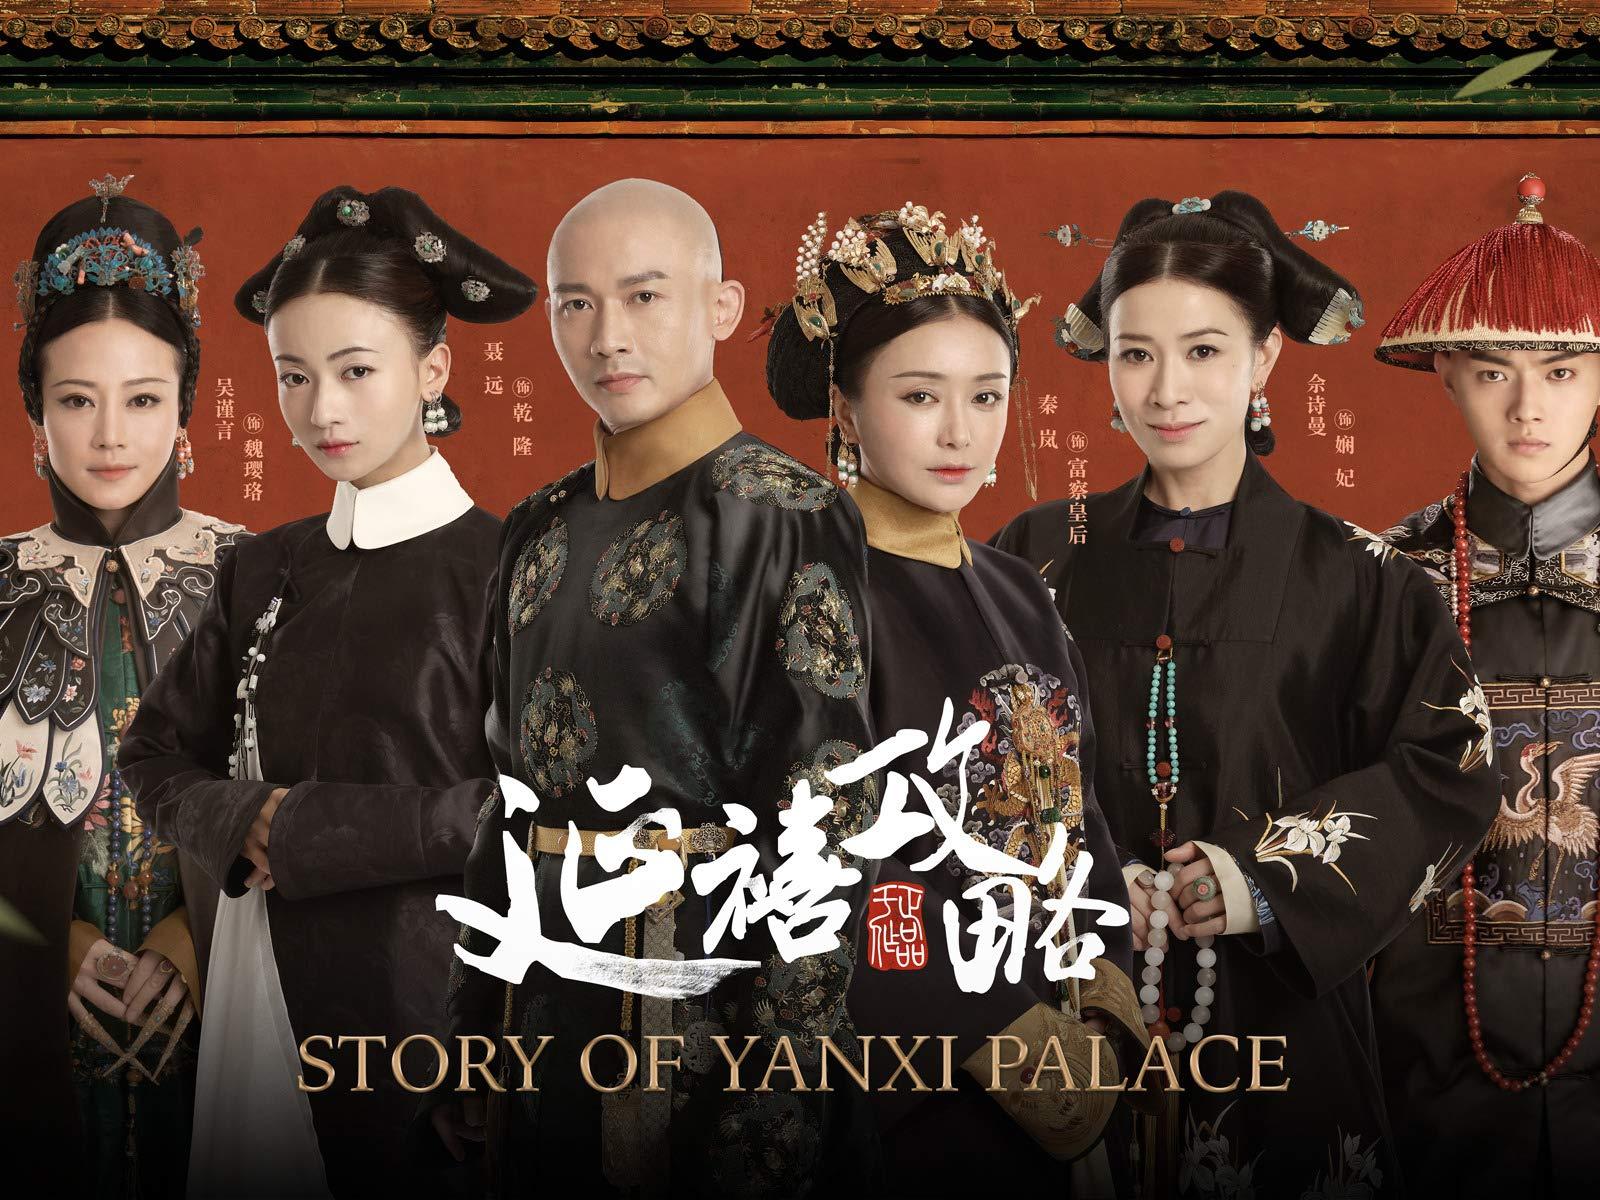 Watch Story of Yanxi Palace | Prime Video